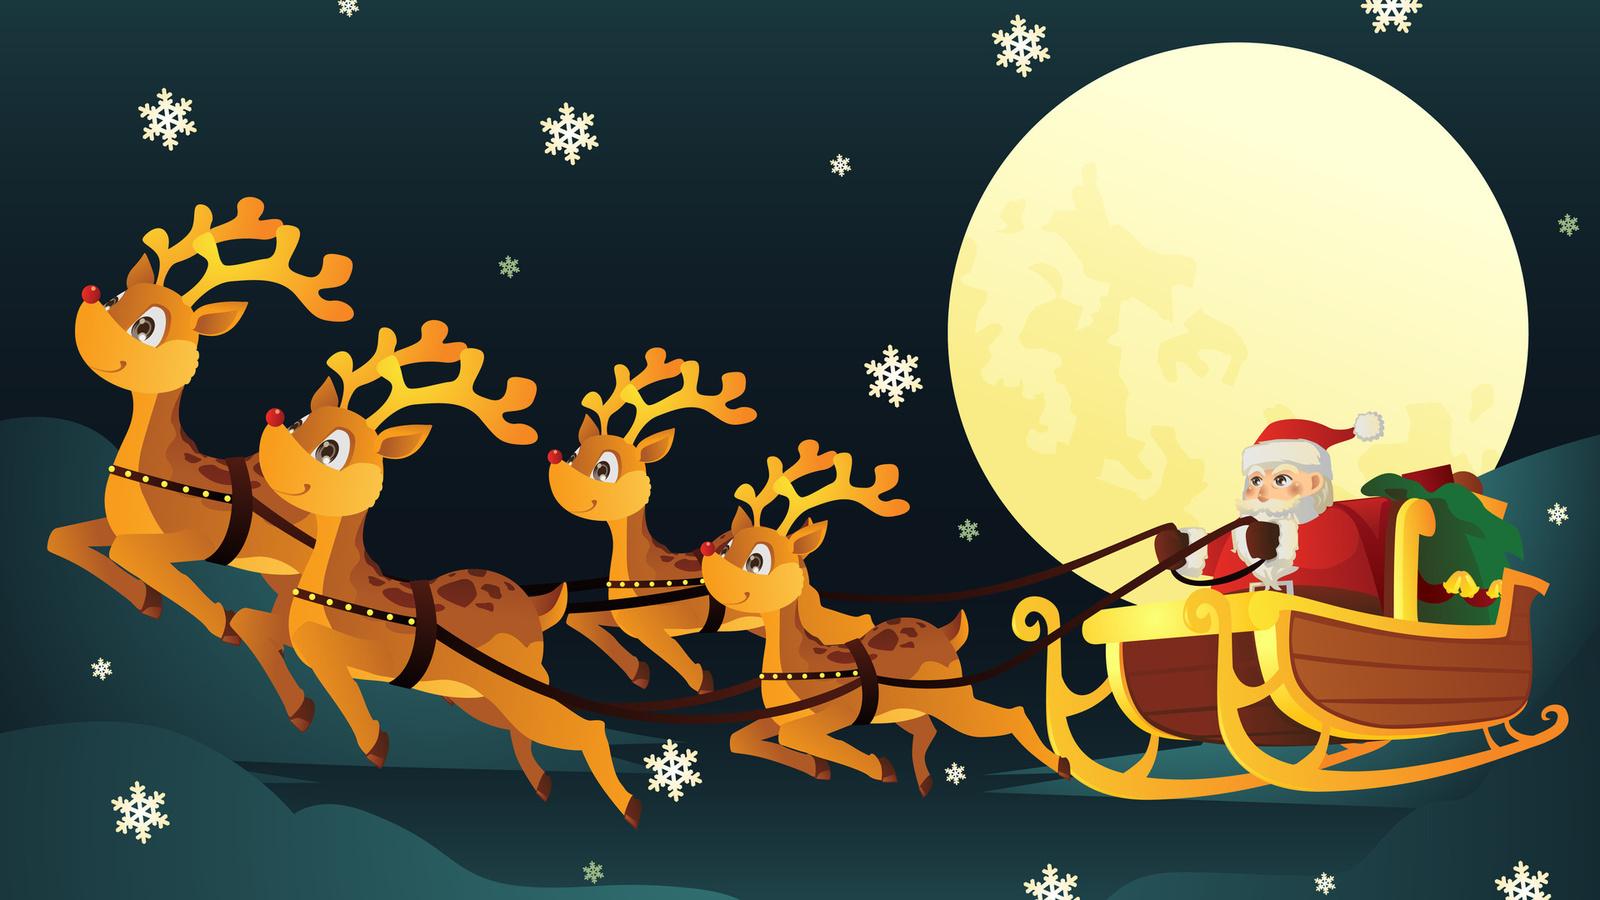 Новогодние картинки сани с оленями, картинки